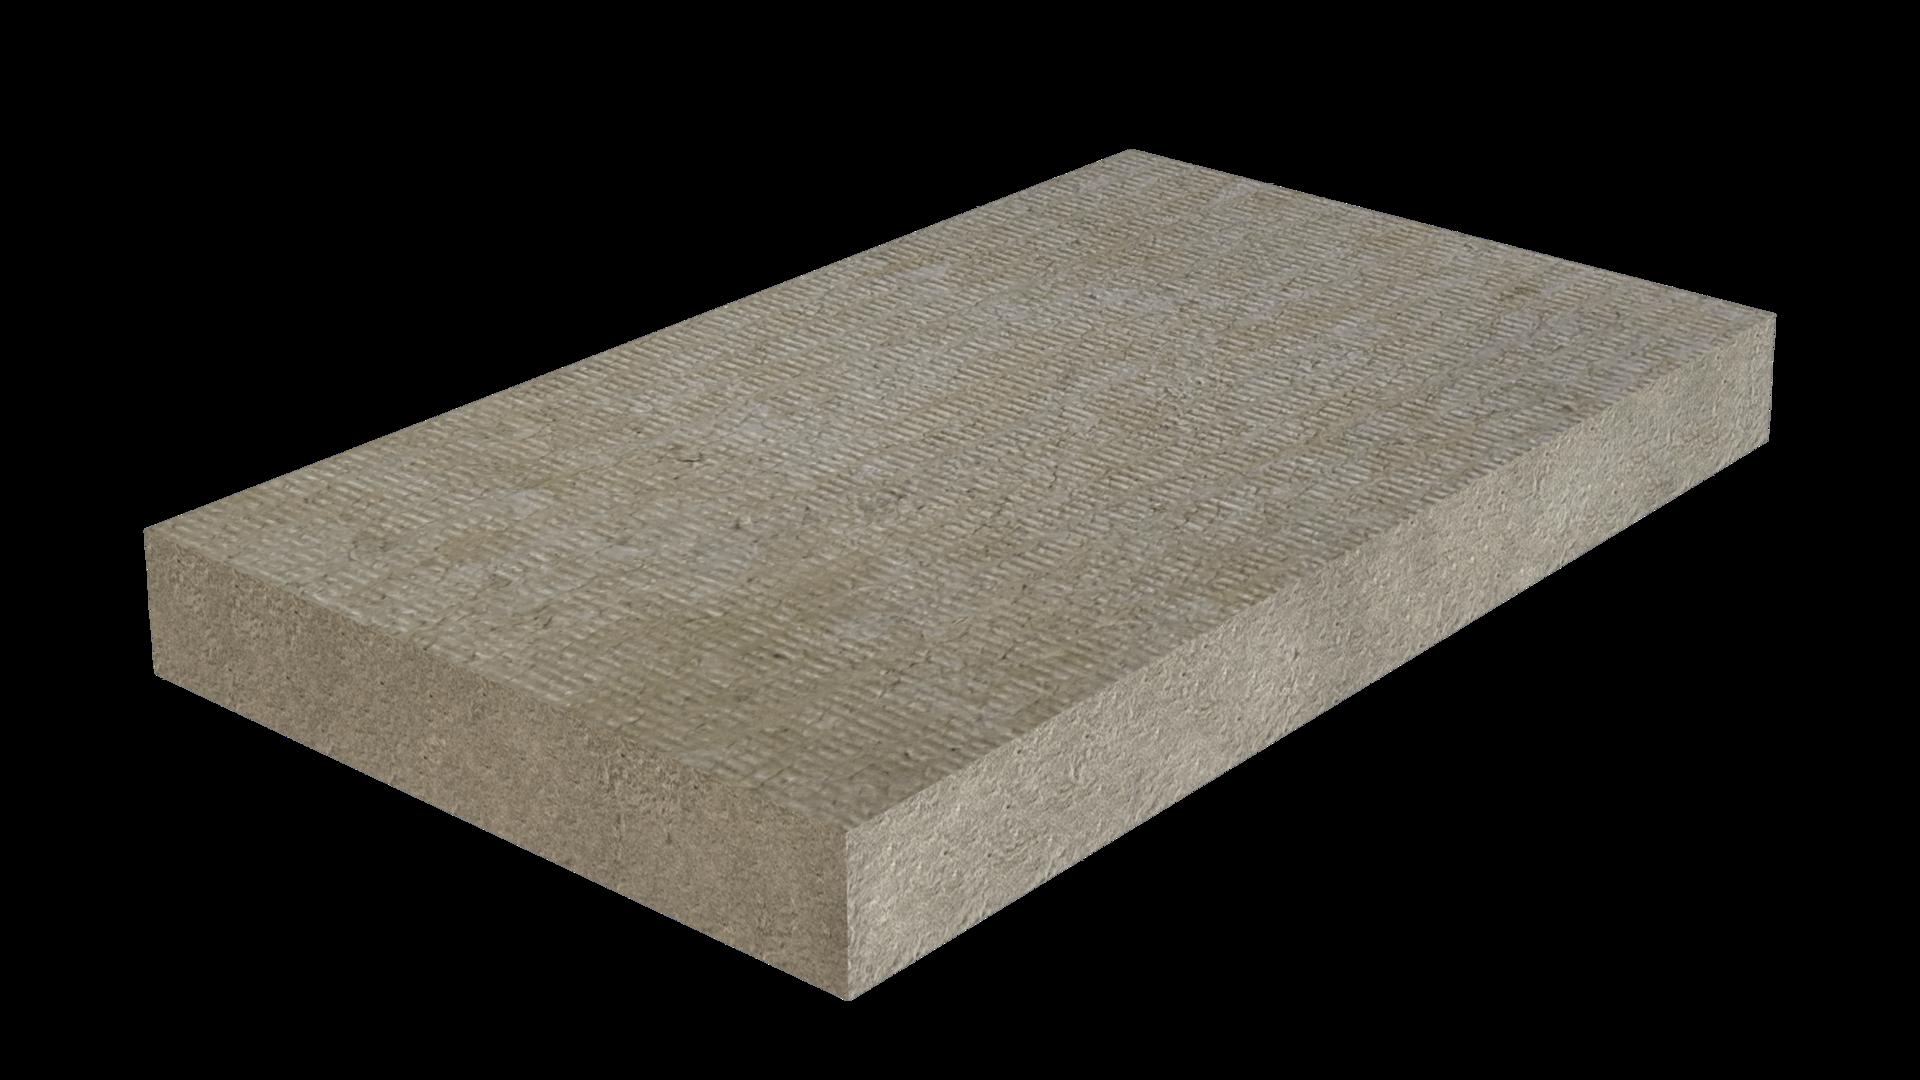 package, product, acoustik batts pro, mats, acoustics, flatroof, internal walls